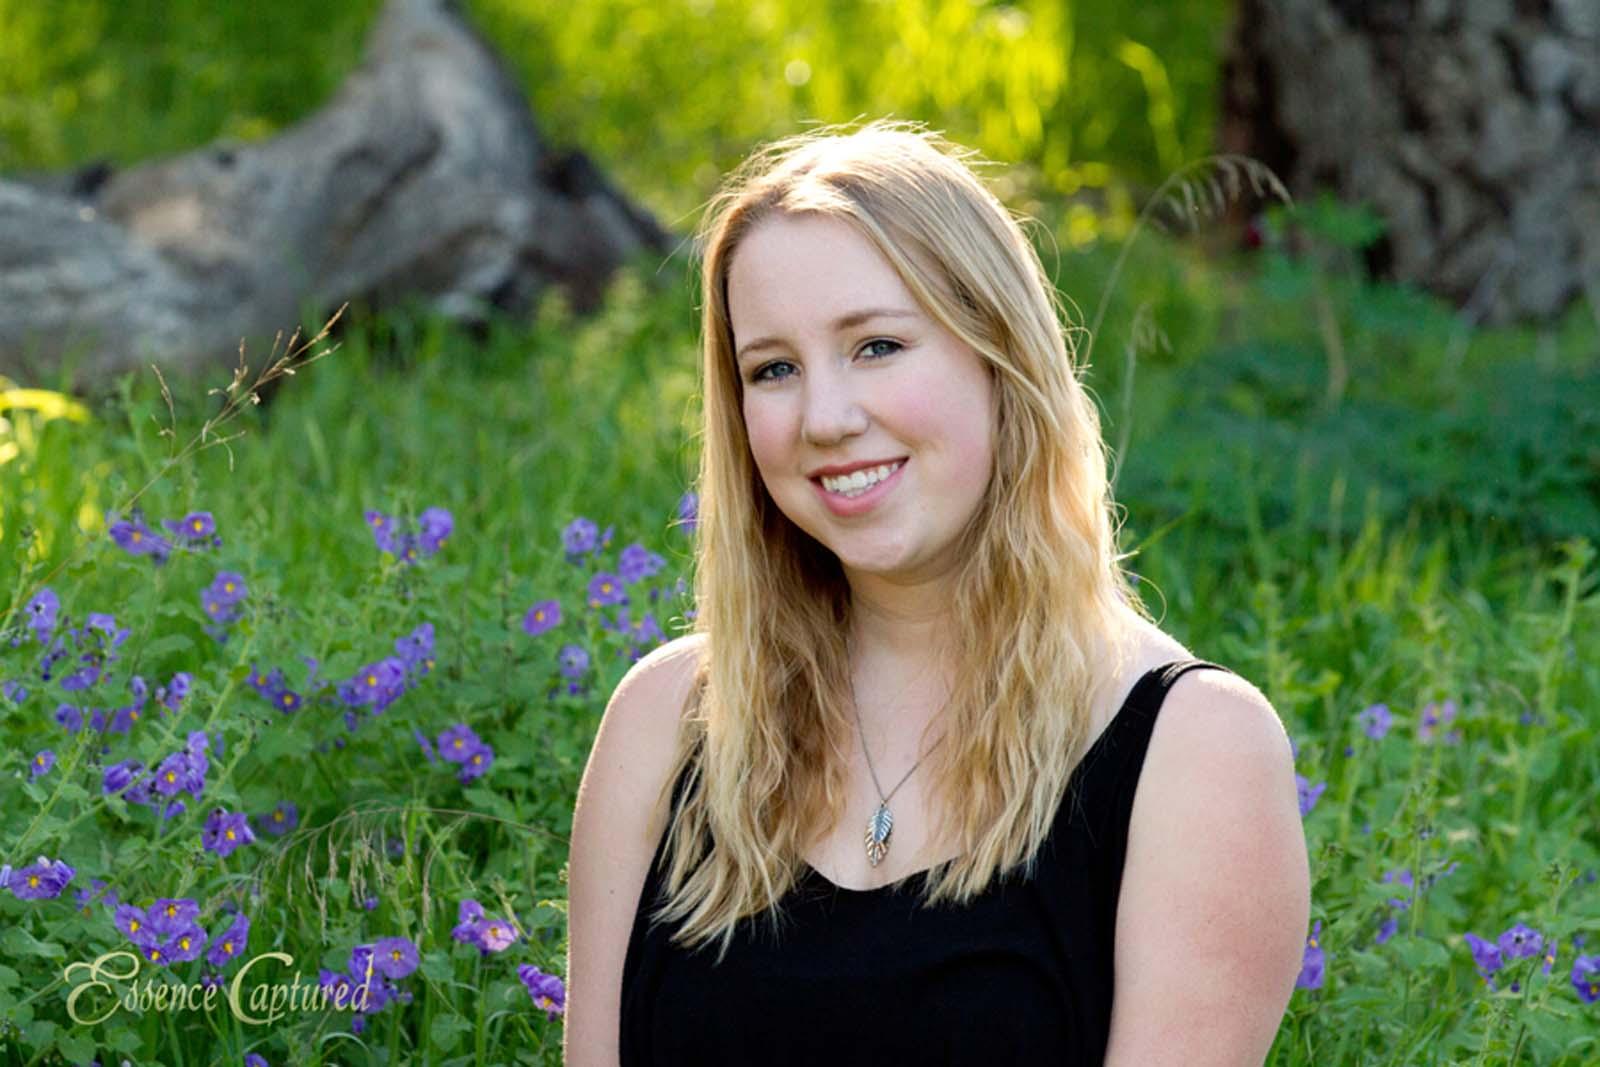 female high school senior portrait sun highlighting blonde hair green grass purple wildflowers